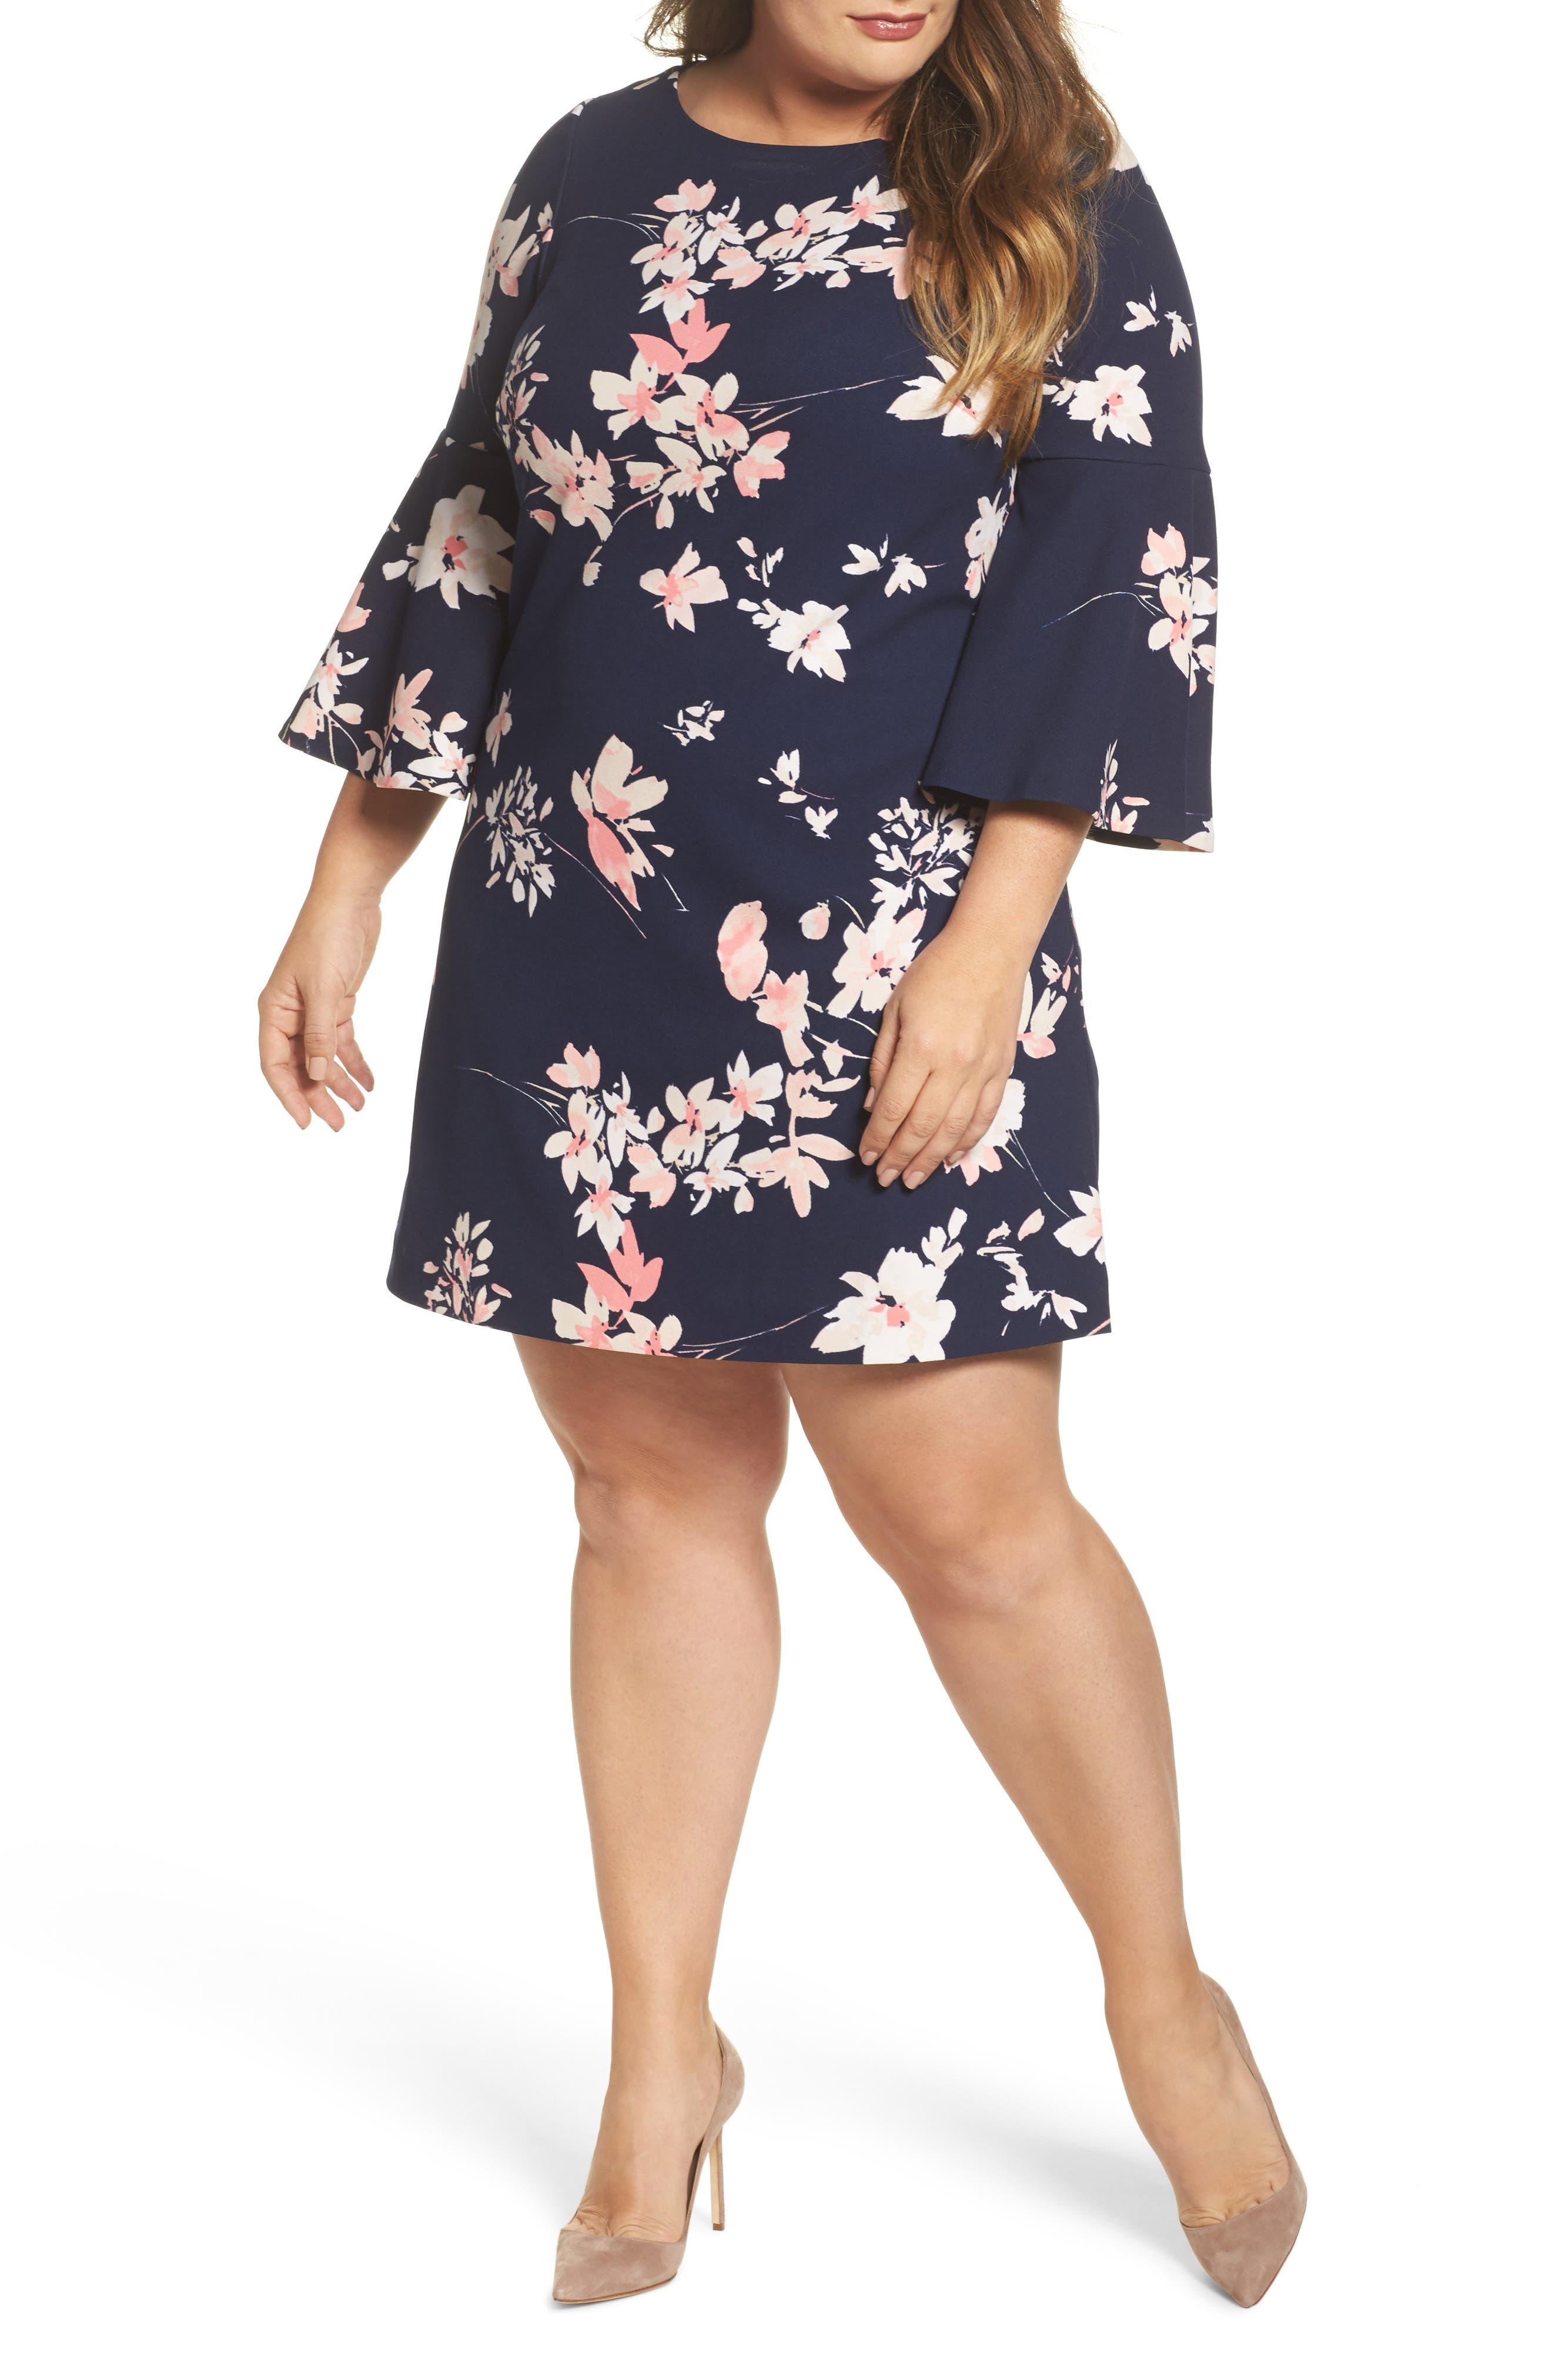 ELIZA J, Floral Print Bell Sleeve Shift Dress, Main thumbnail 1, color, NAVY/ PINK